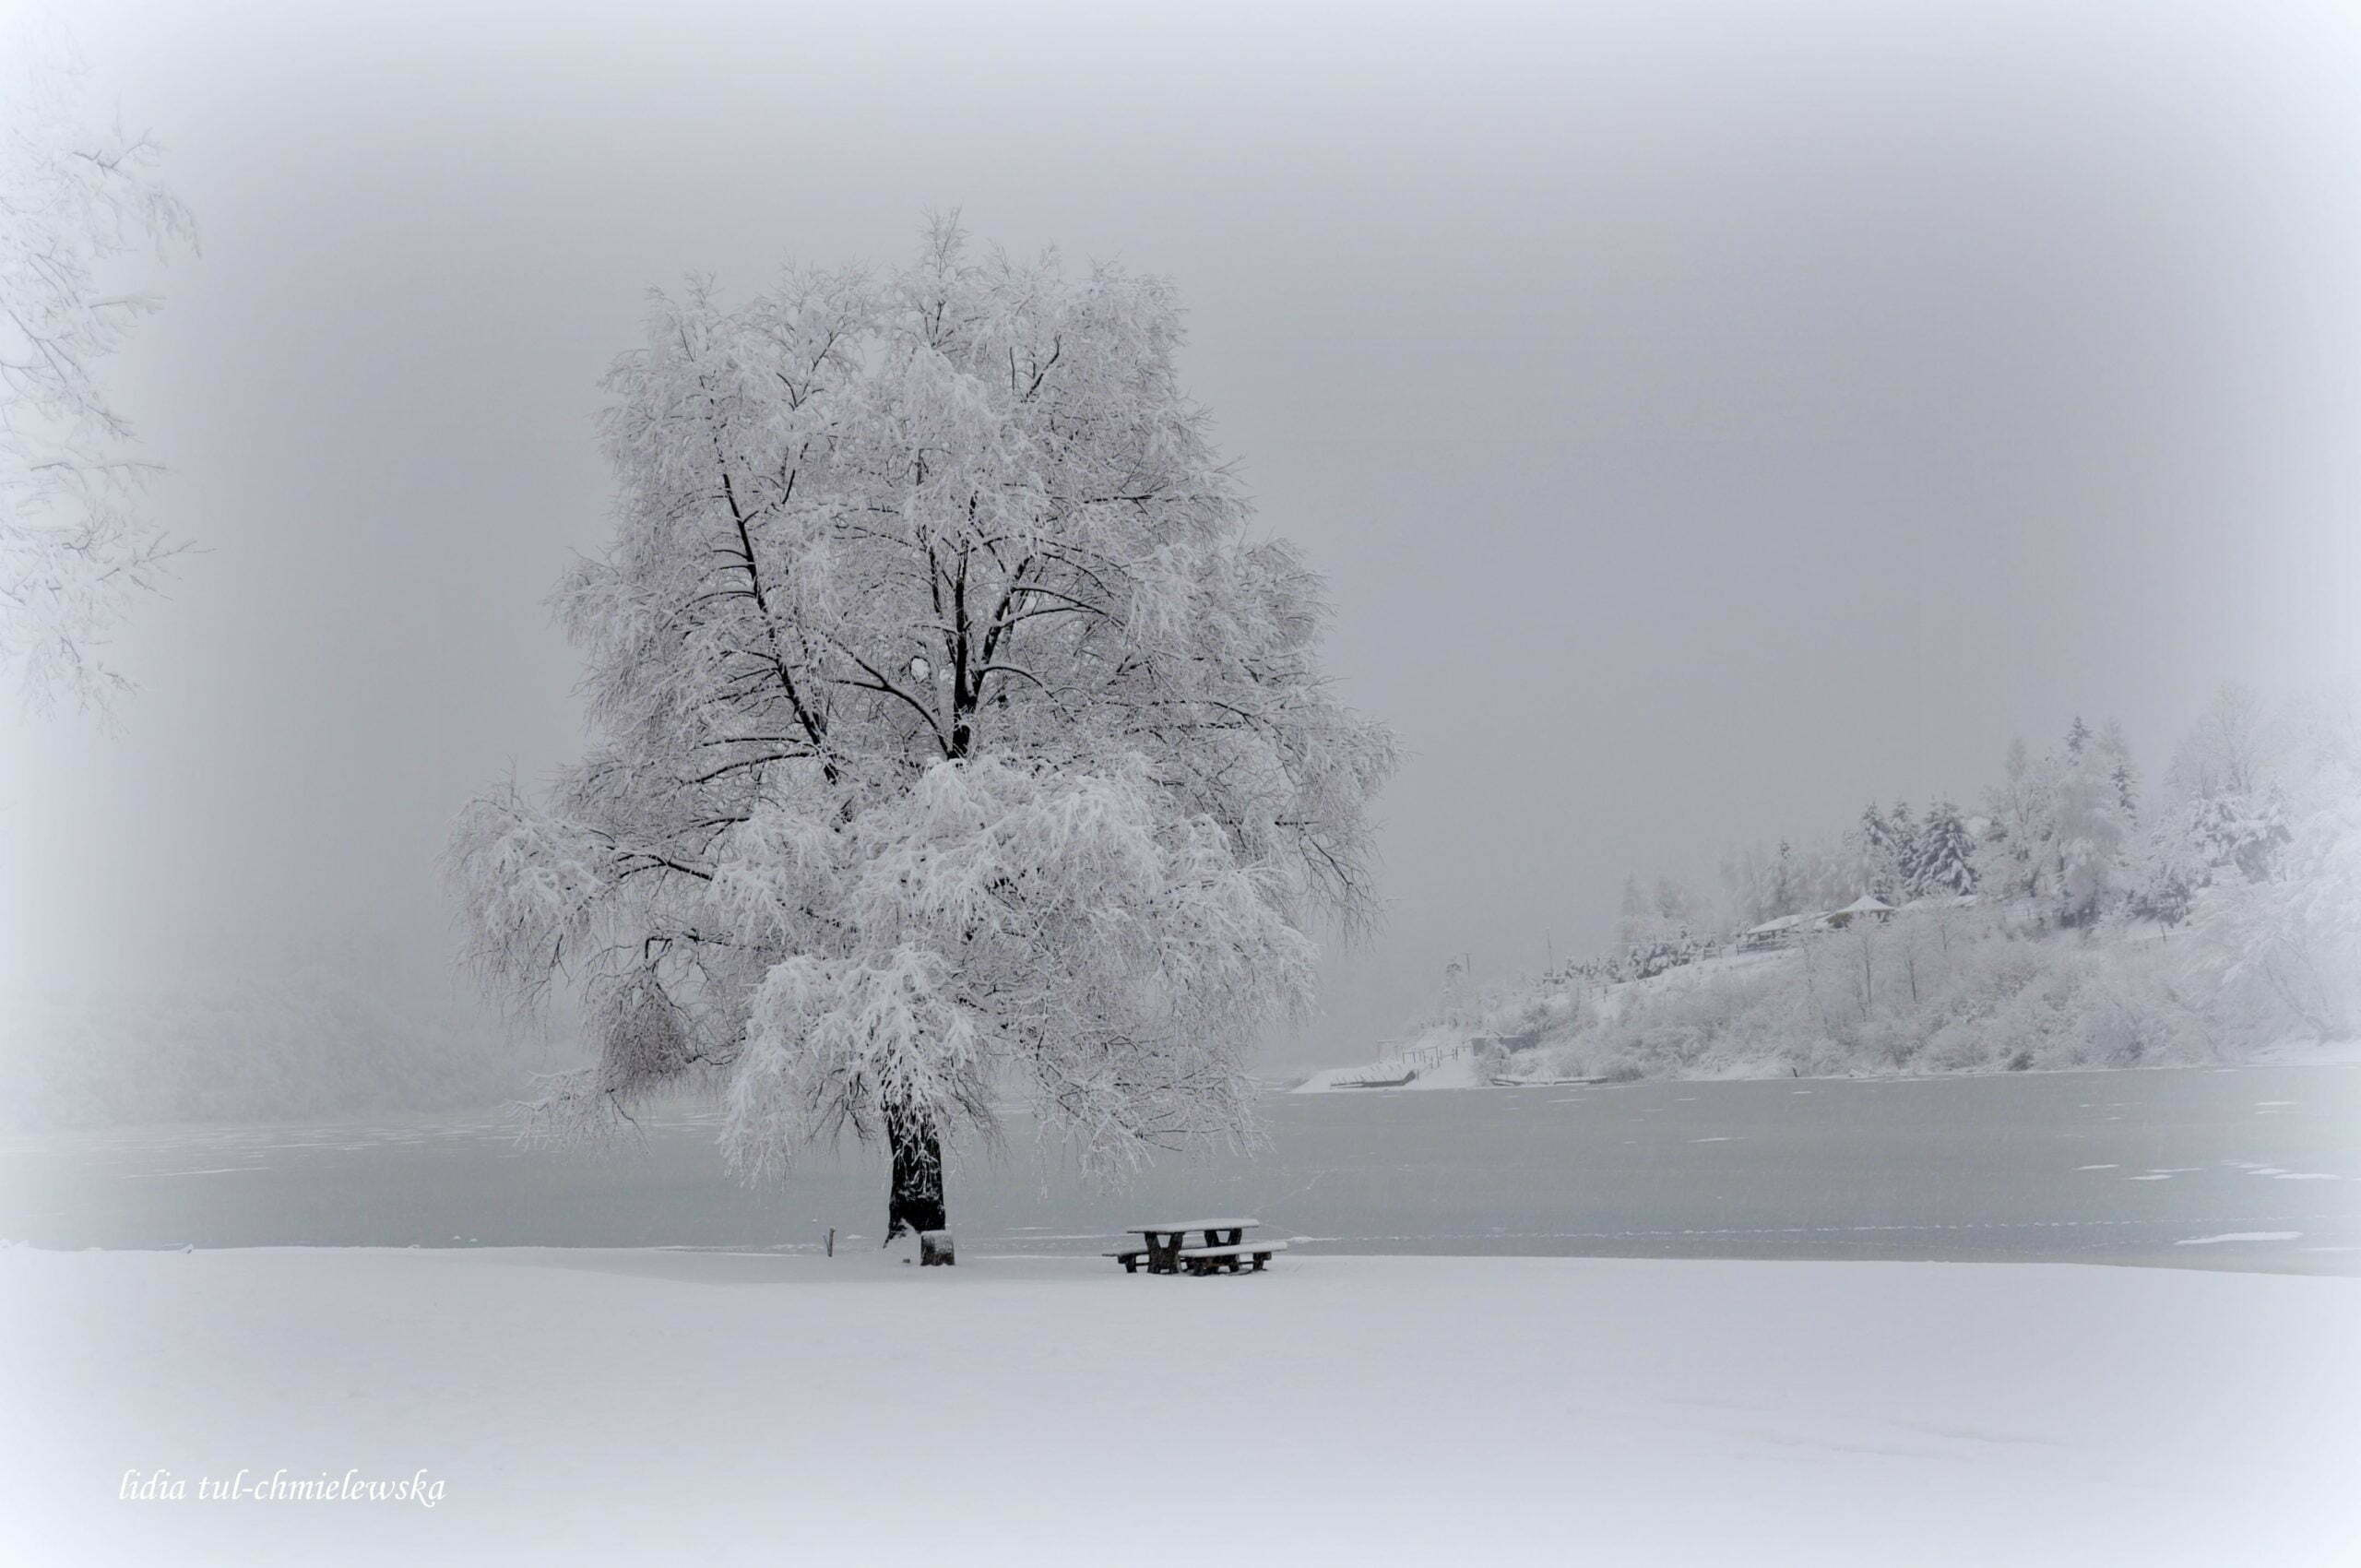 Czarno i biało/fot. Lidia Tul-Chmielewska